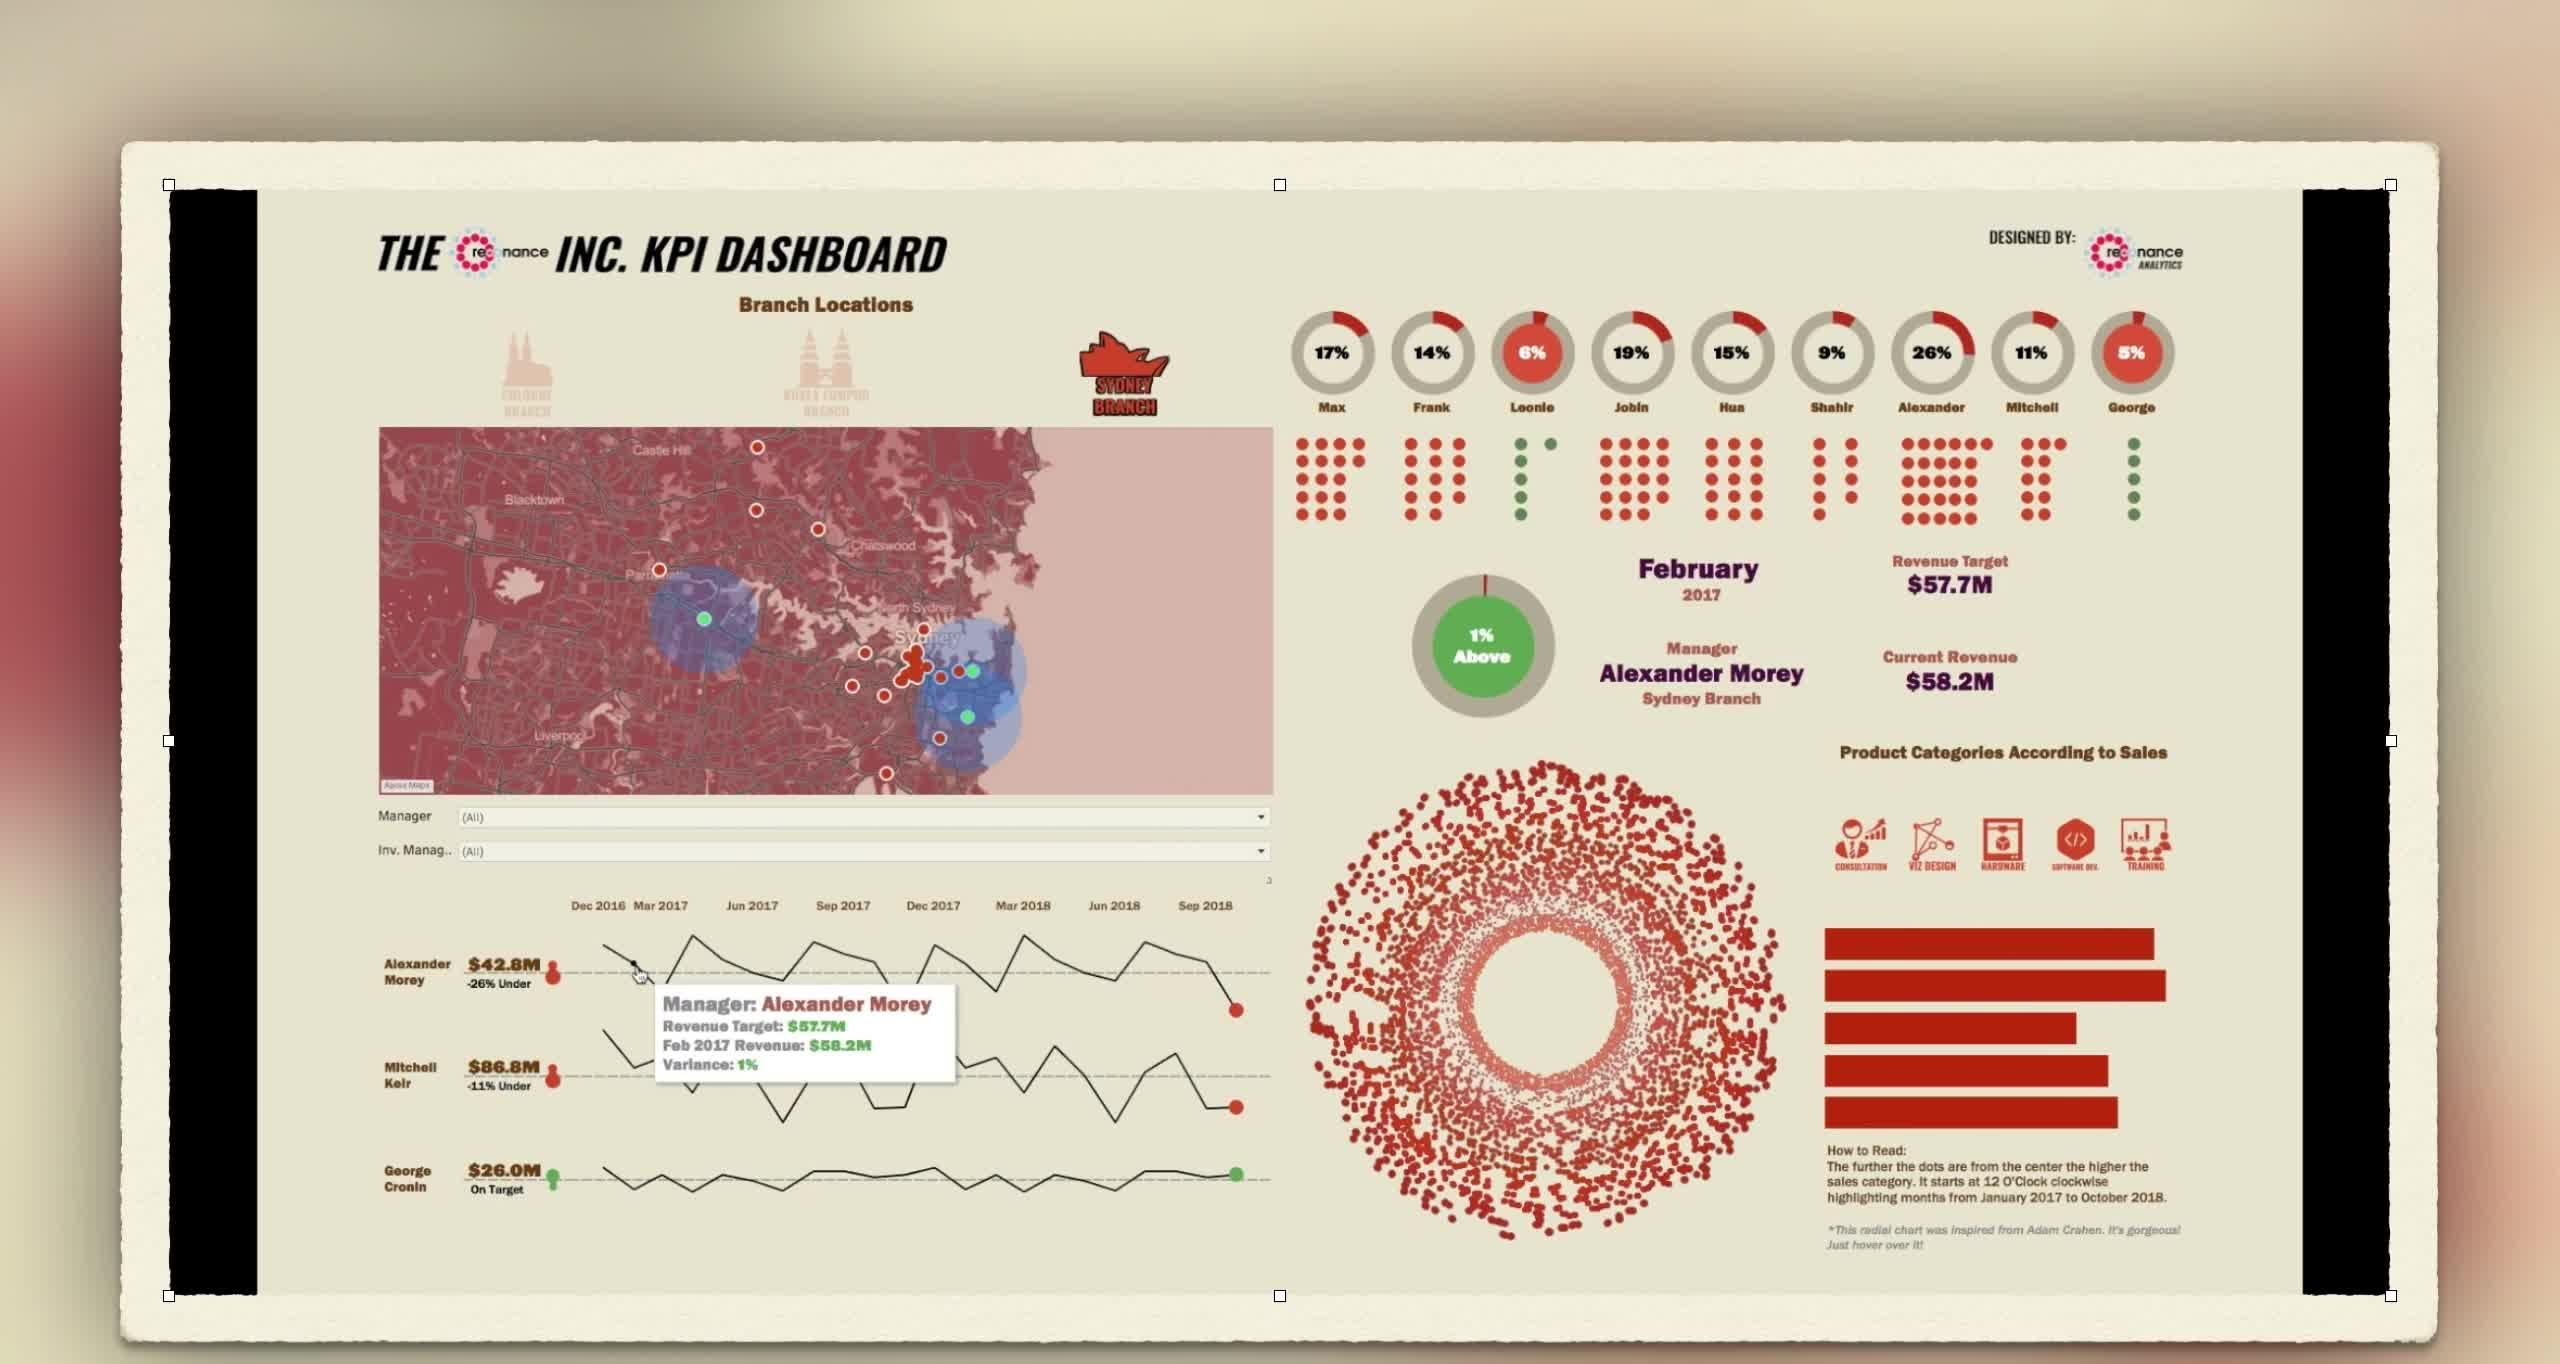 GIF Brewery, KPI Dashboard GIFs